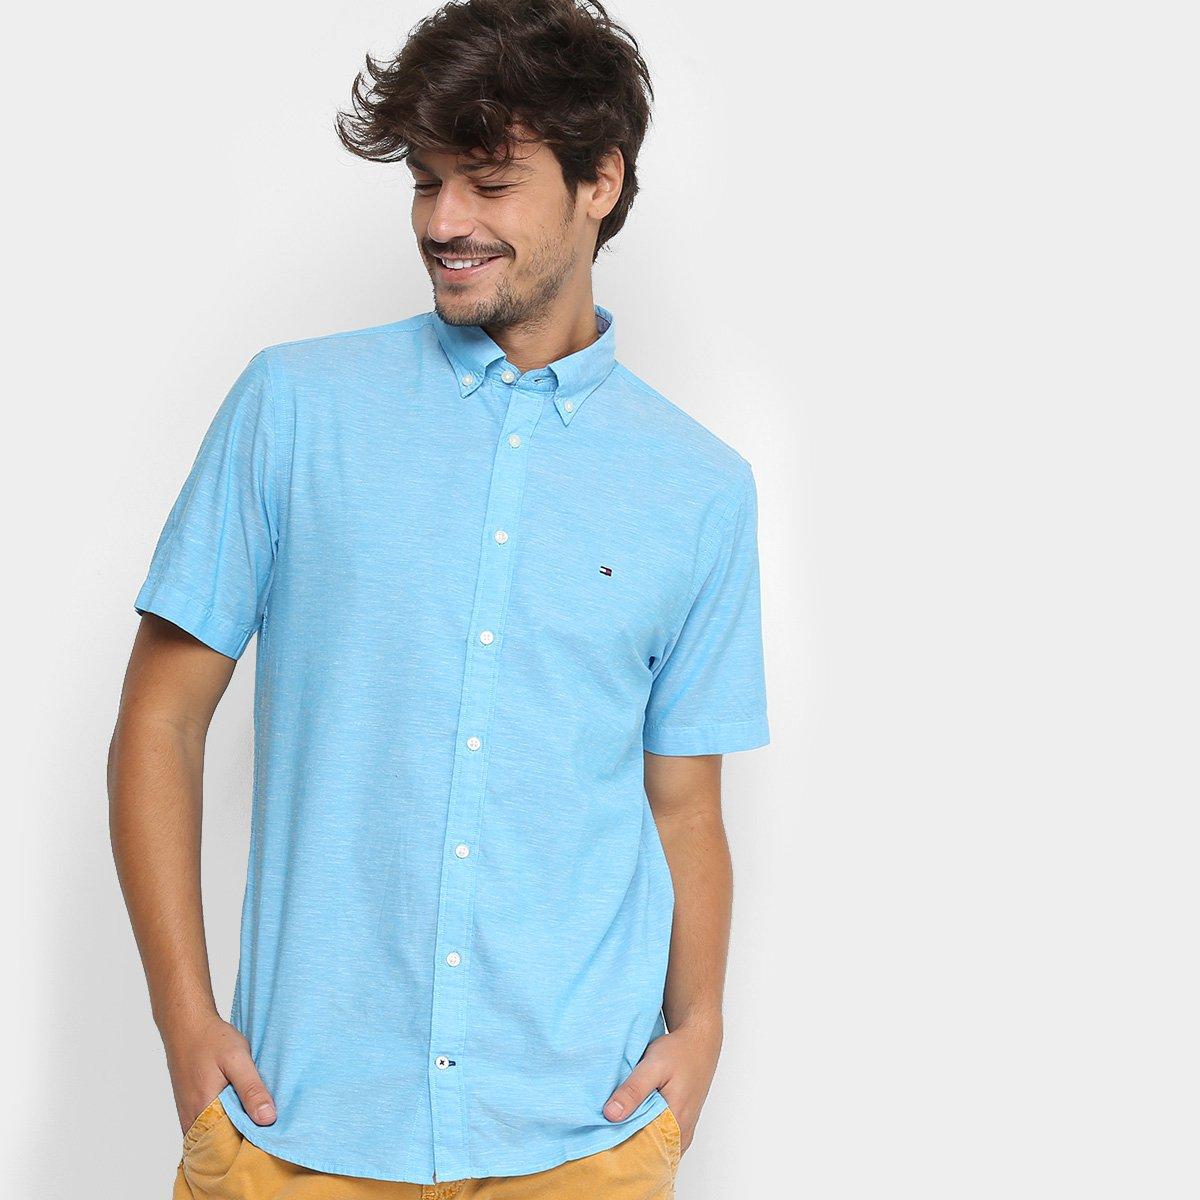 9dd3868567f3 Camisa Manga Curta Tommy Hilfiger Fio A Fio Regular Fit Masculina ...